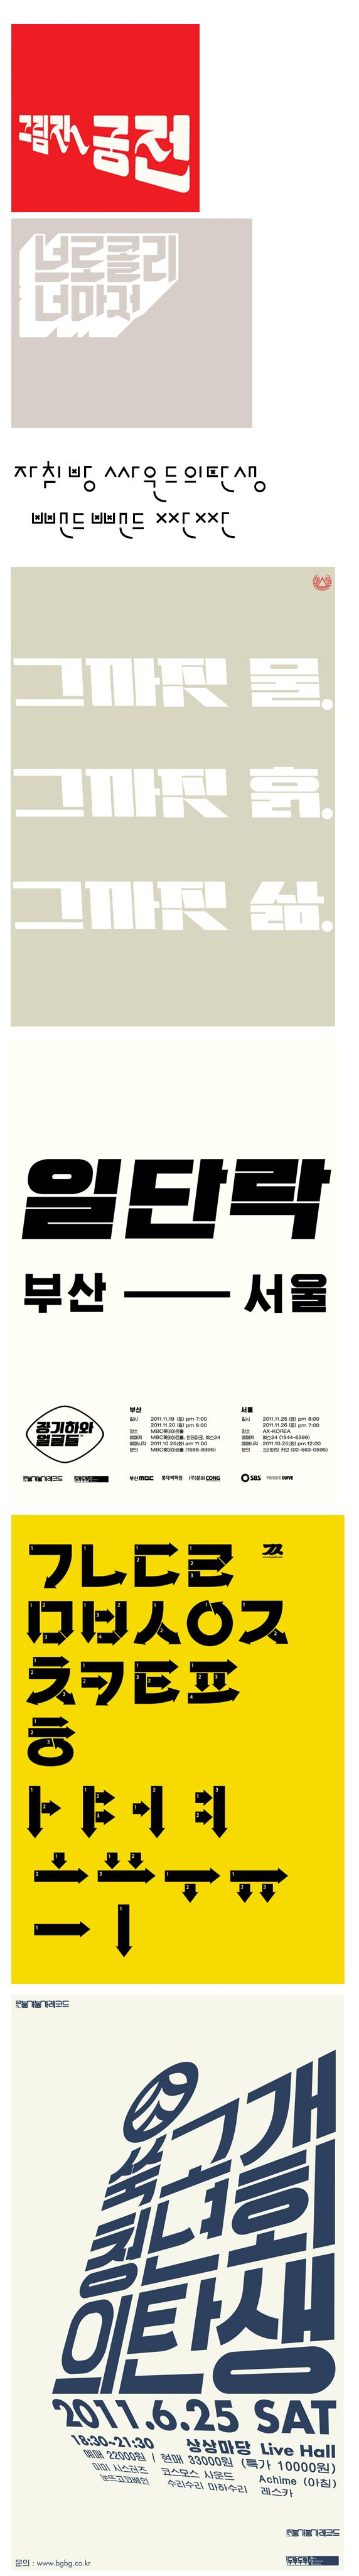 http://kijet.egloos.com/  김기조 한글디자인